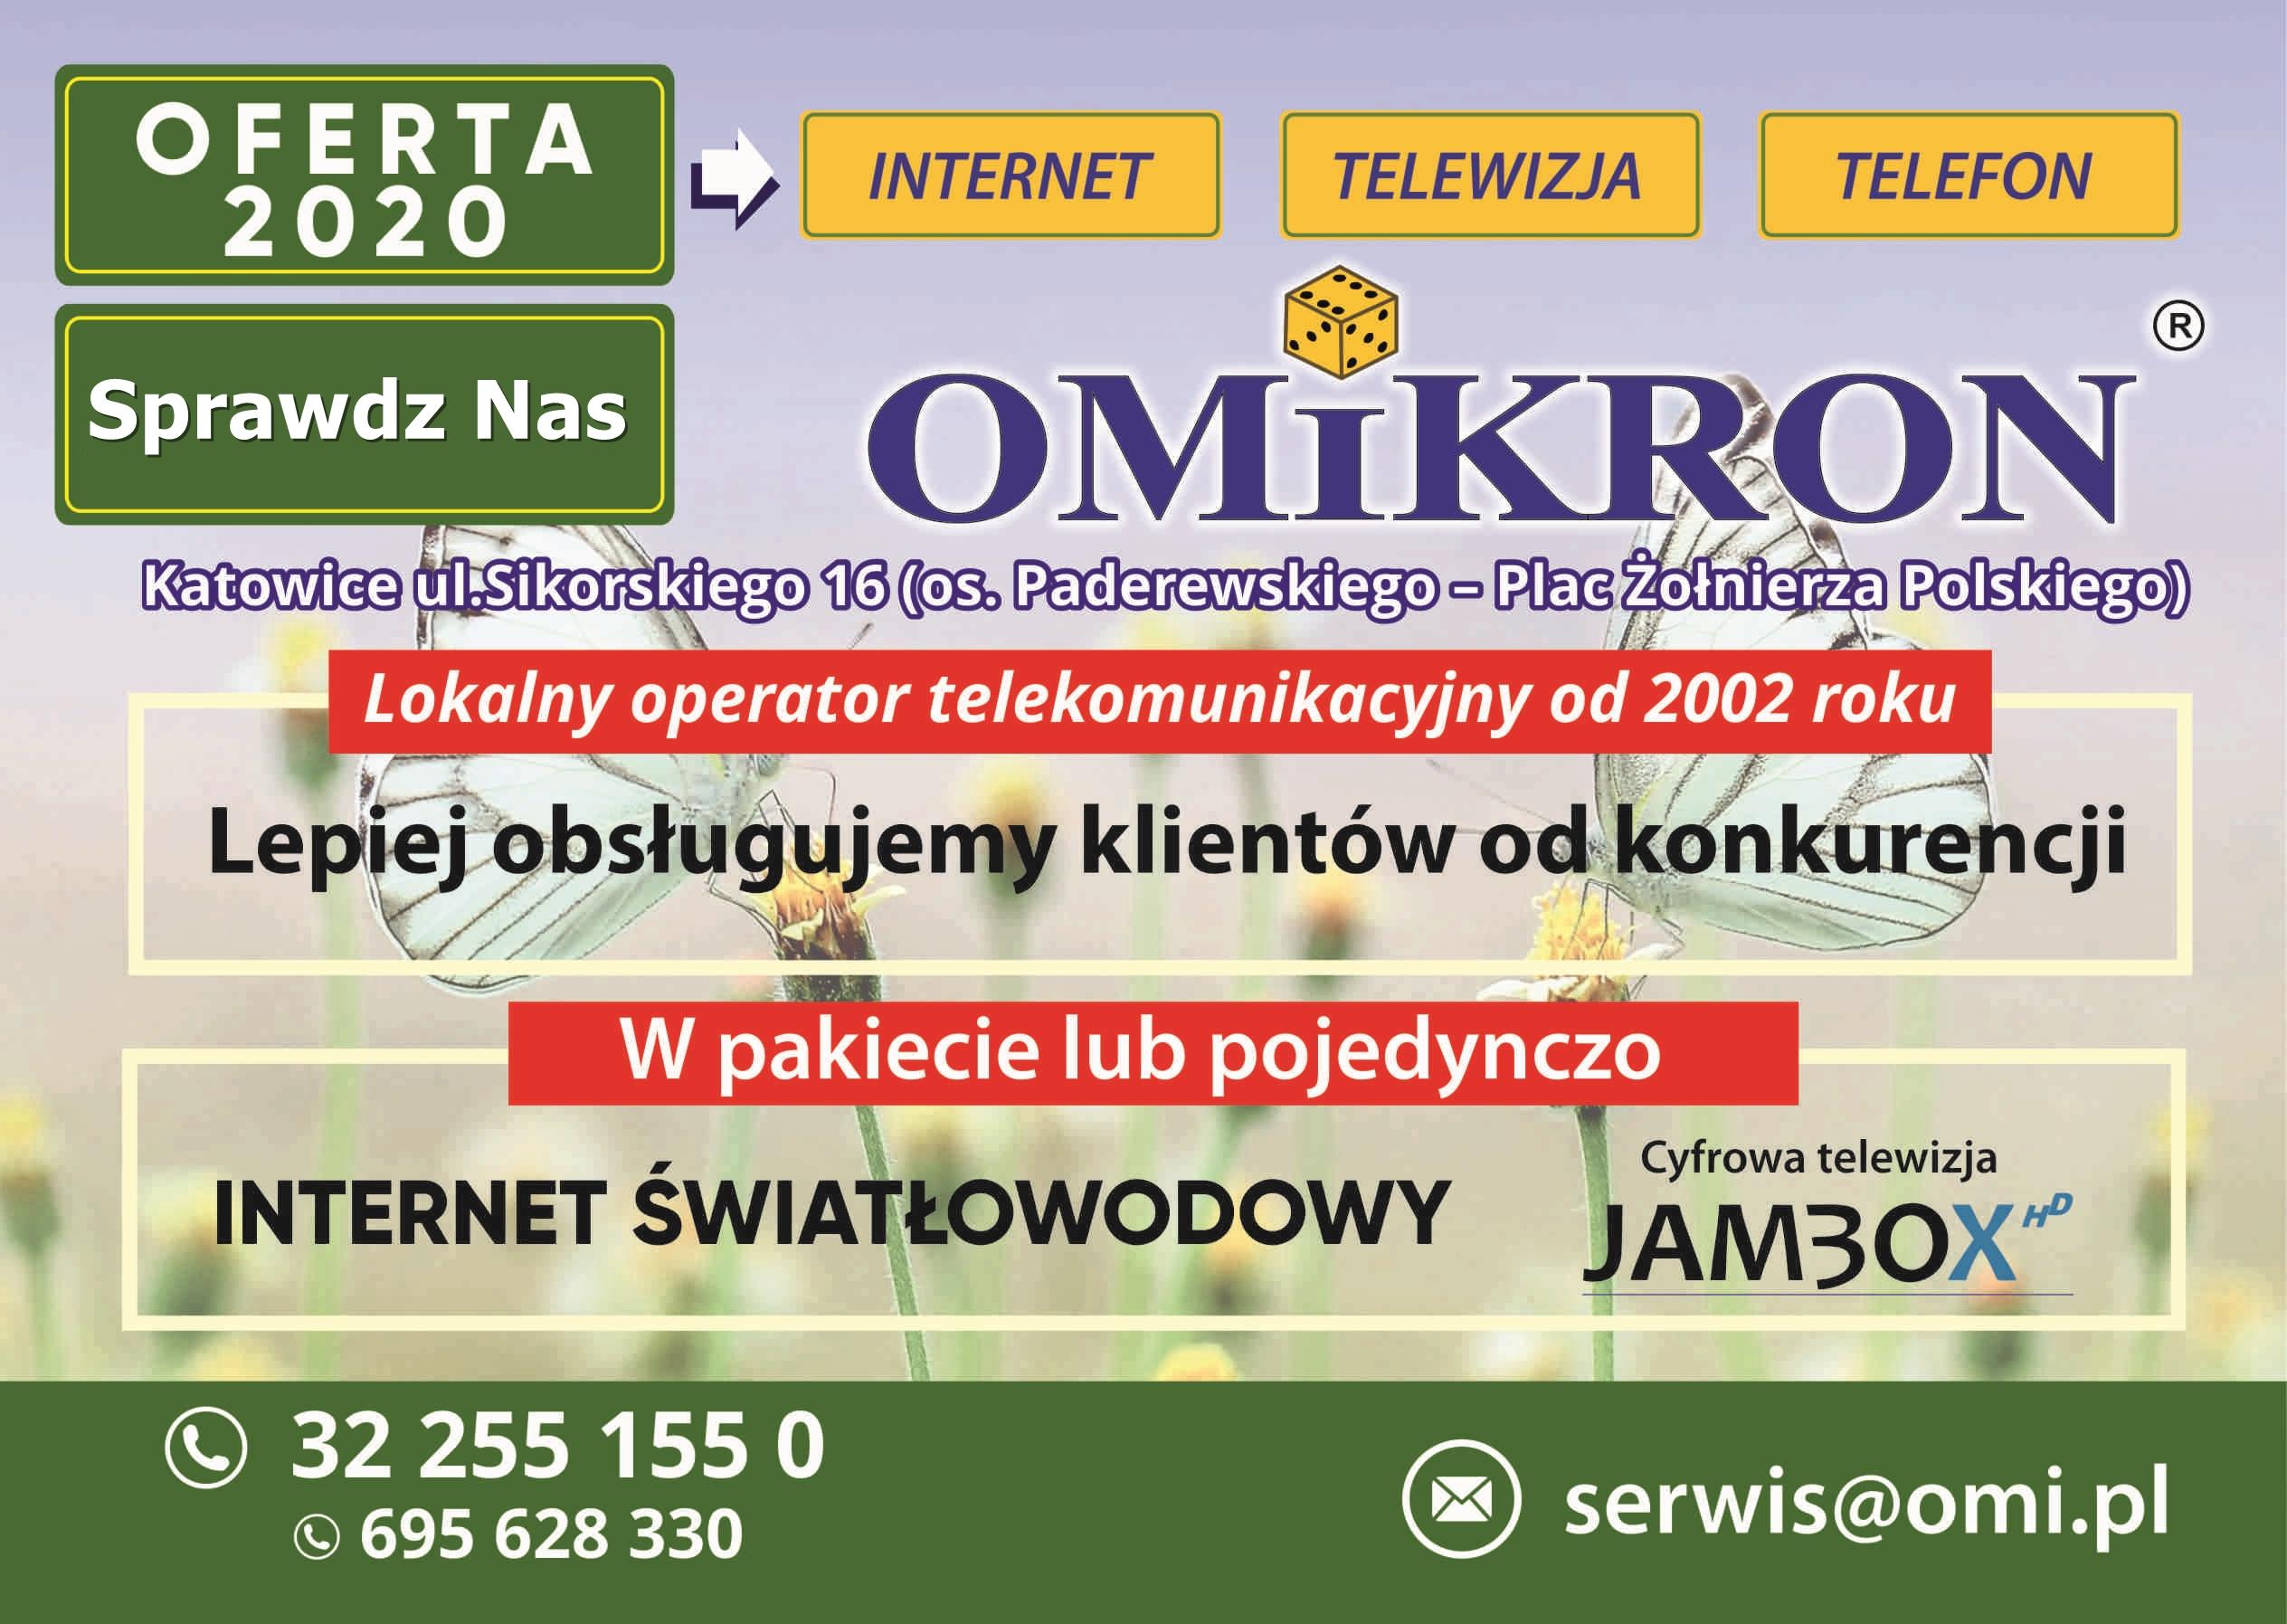 D Omikron A5_oferta2020_rewers